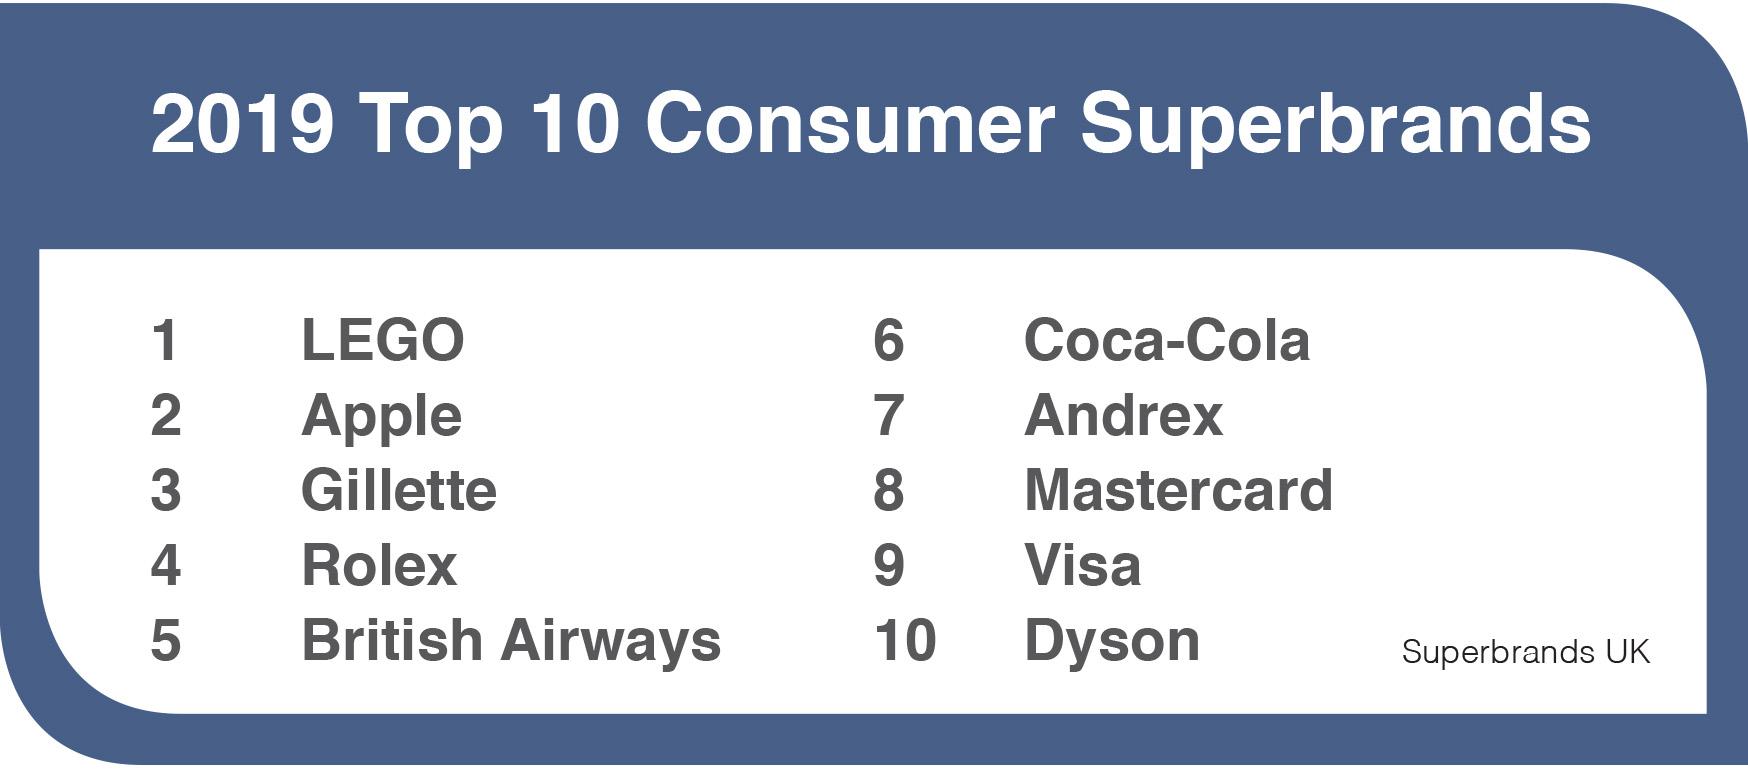 Consumer Superbrands 2019 Top 10.jpg